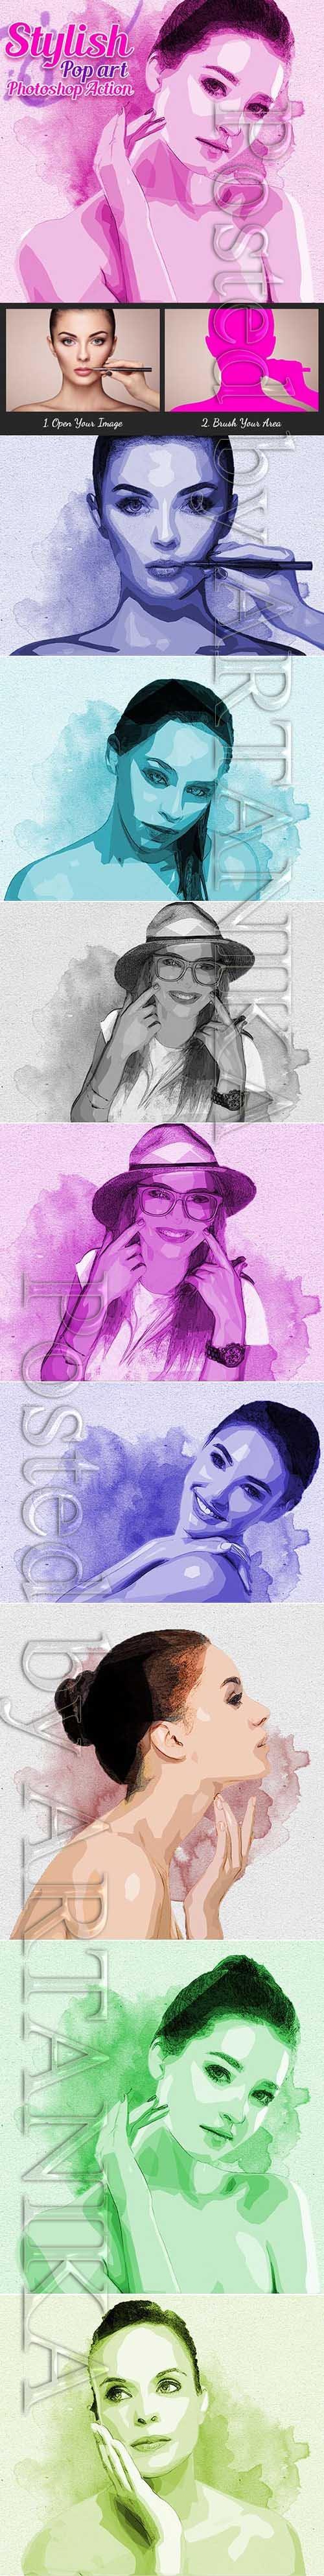 GraphicRiver - Stylish Pop Art Photoshop Action 21351891